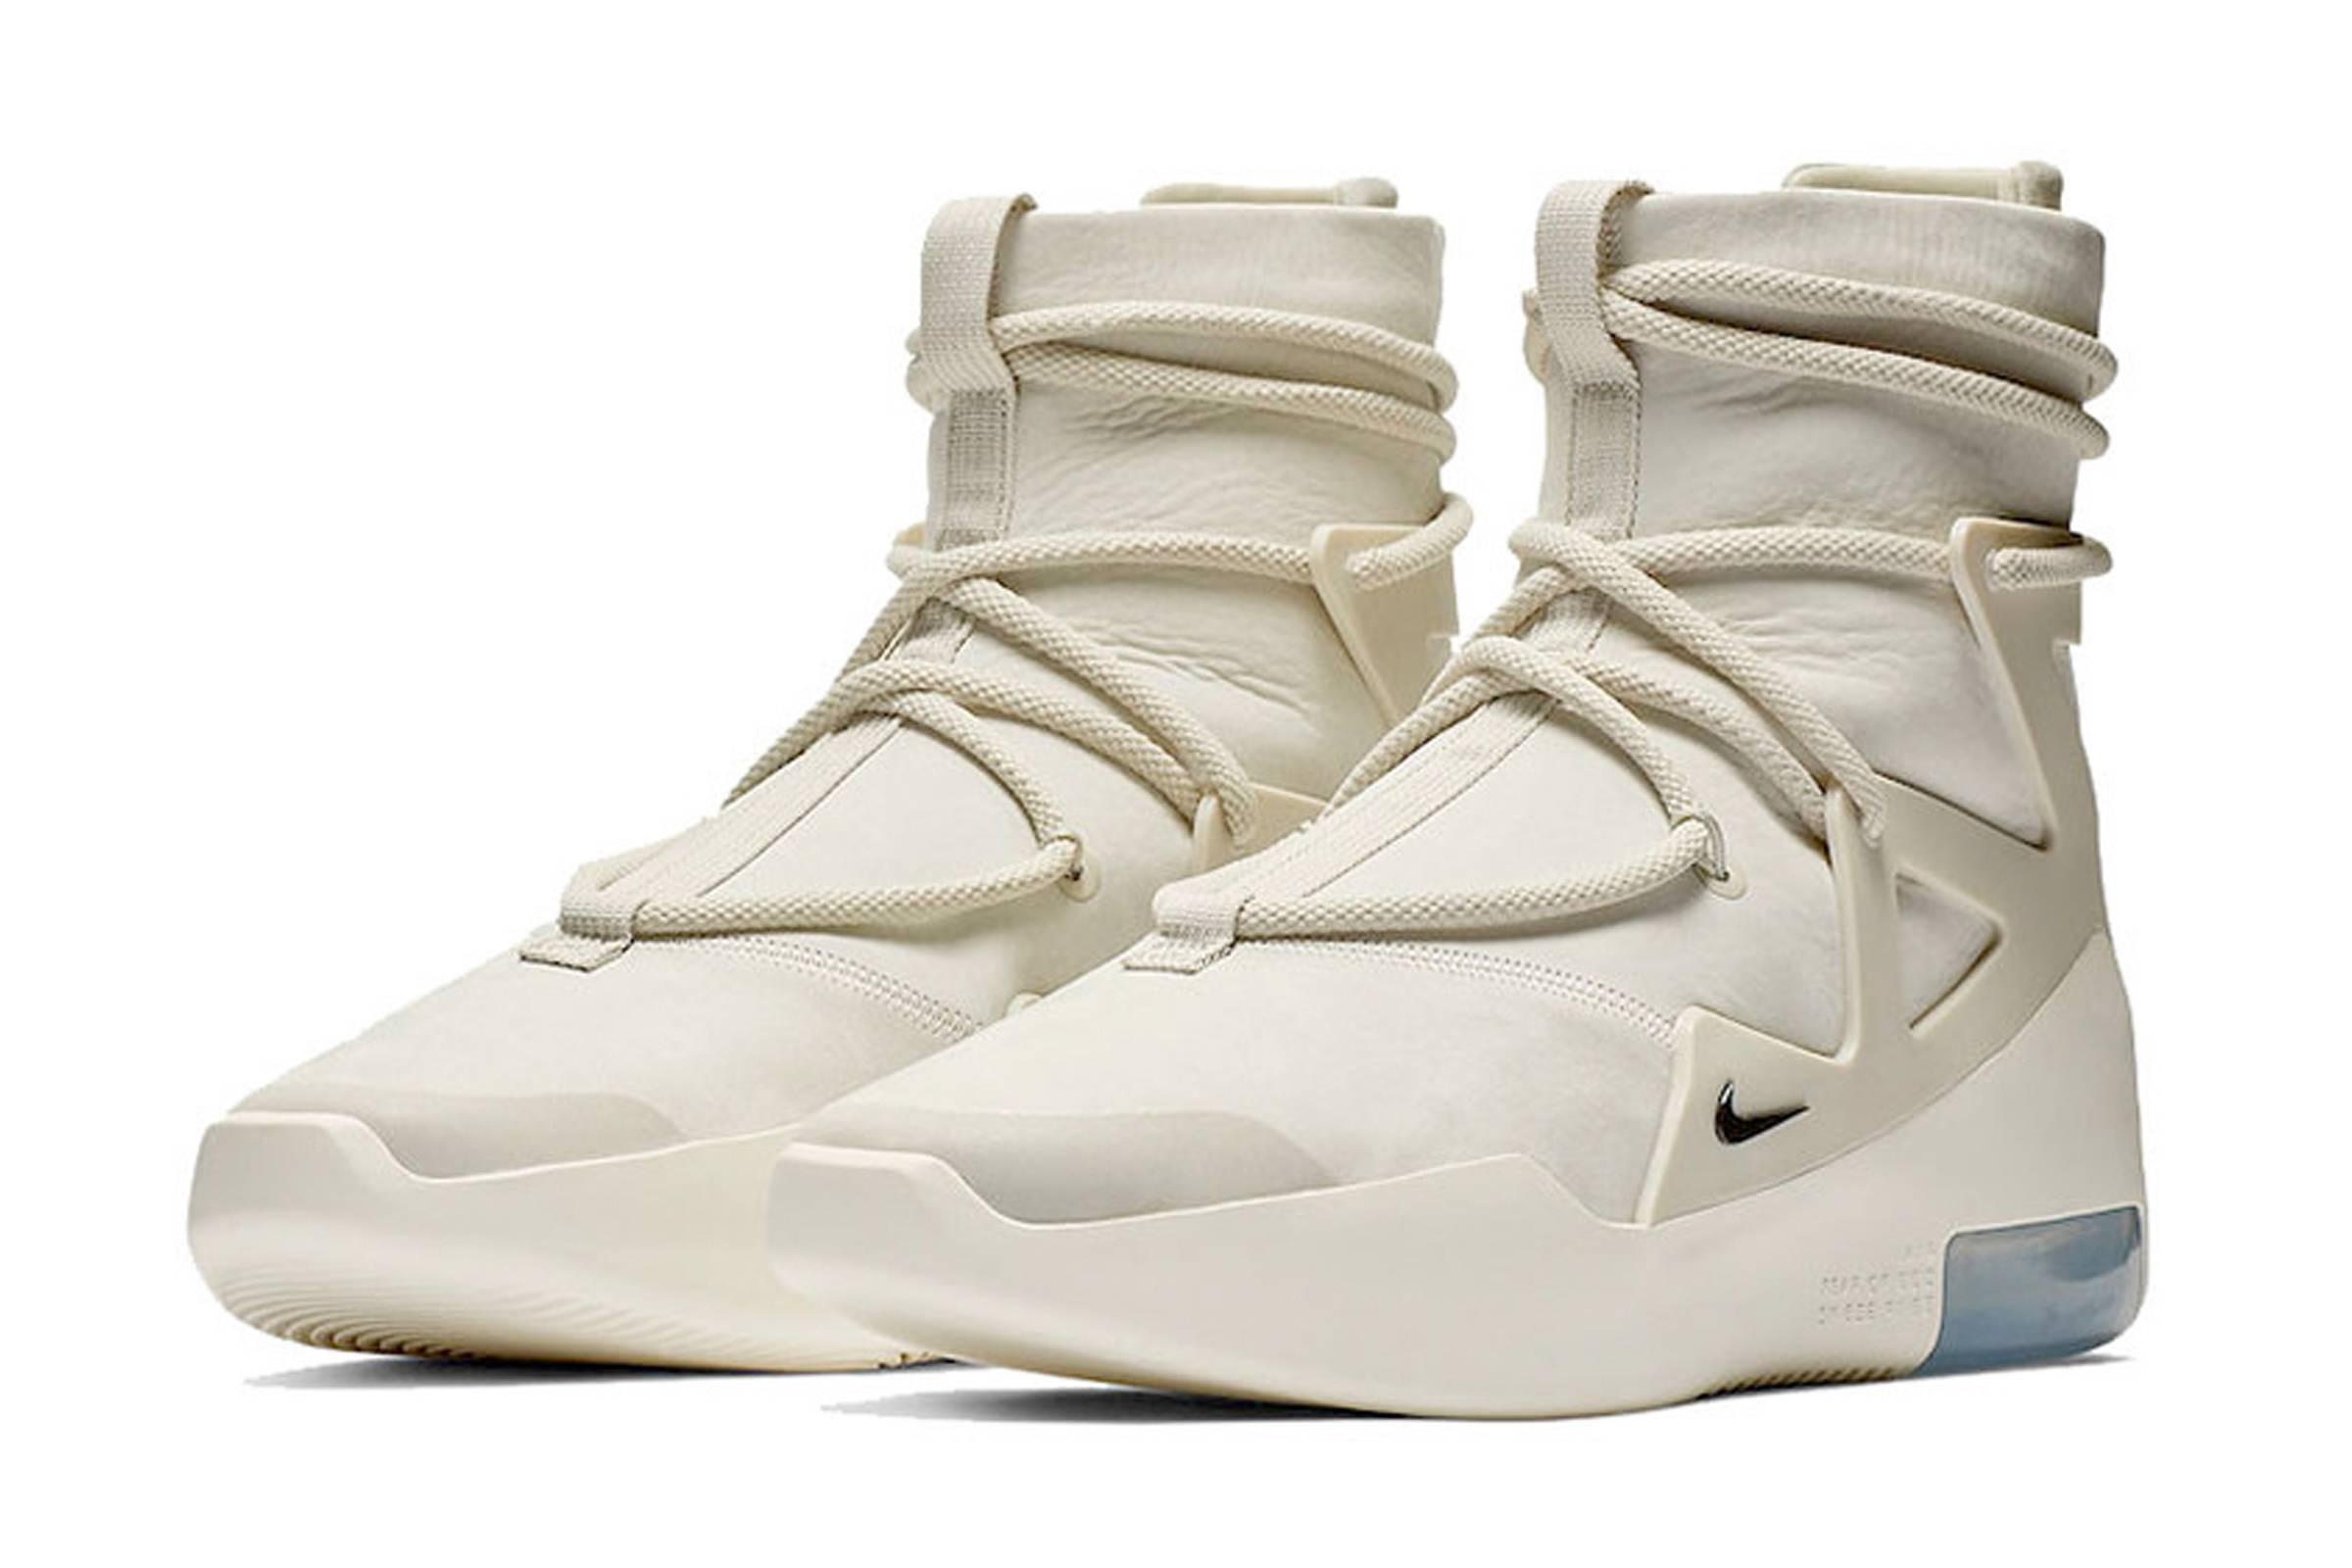 The Nike Air Fear of God 1 Drops in Light Bone January 12